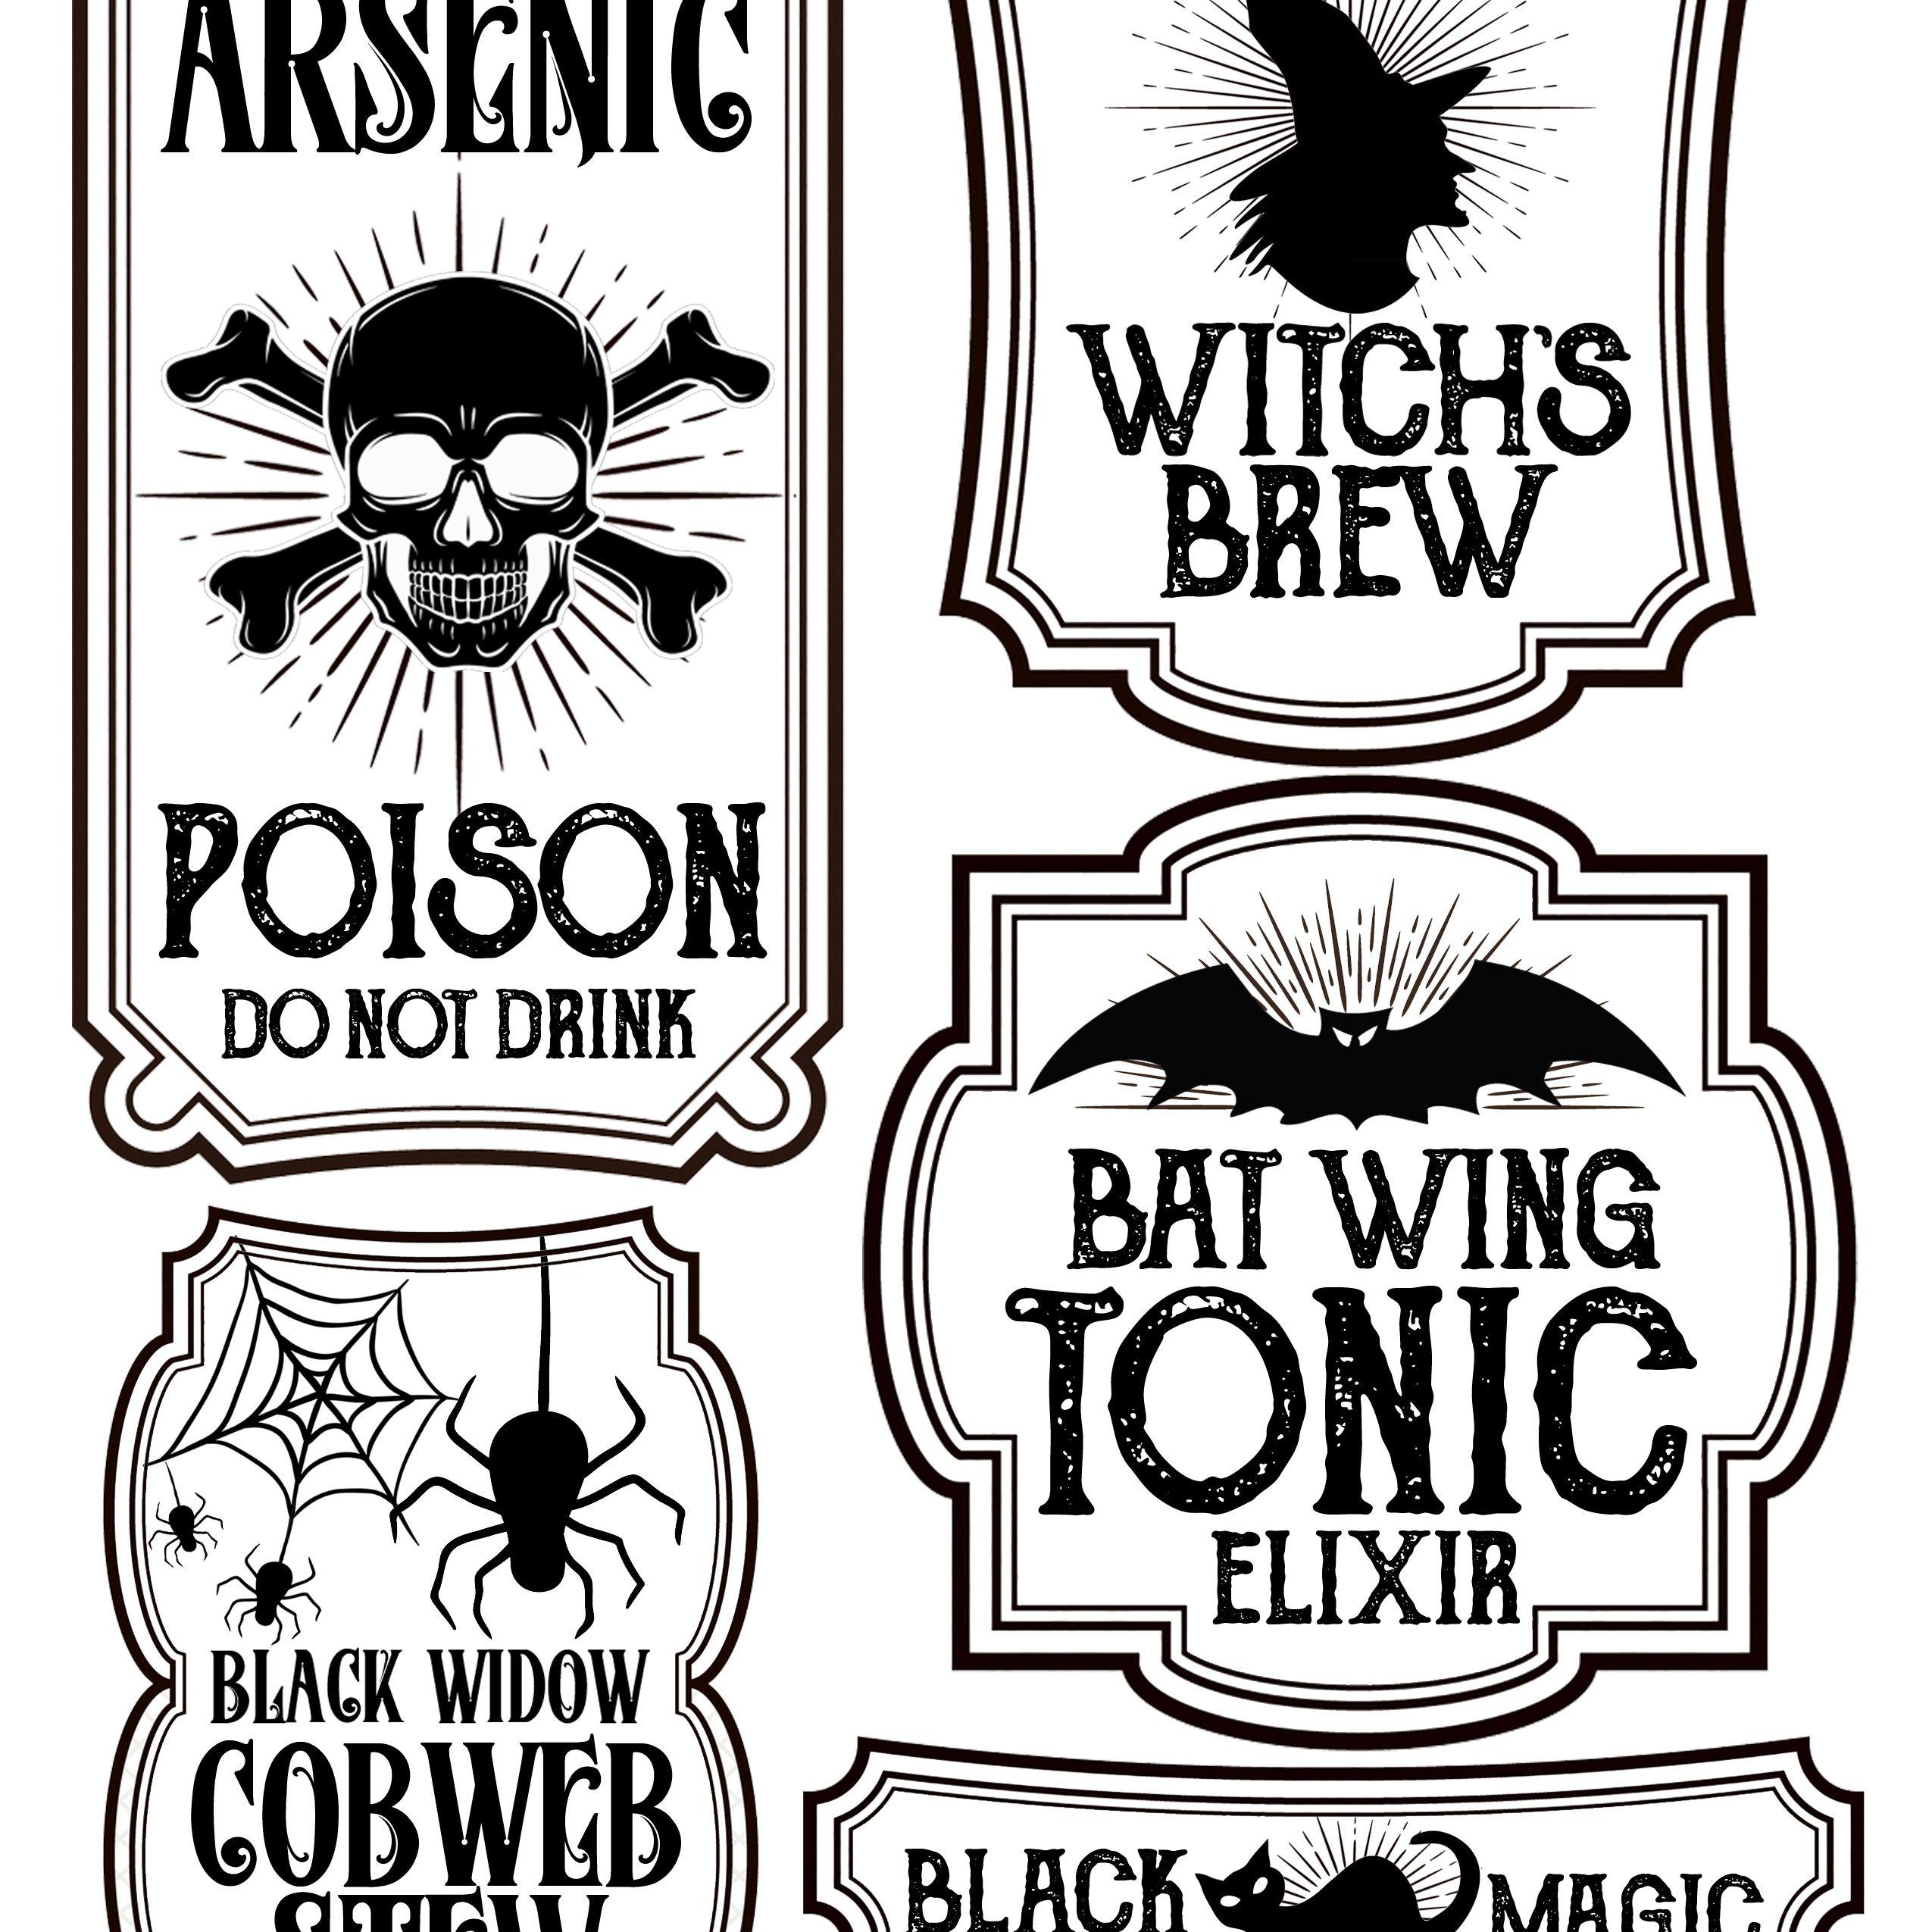 Halloween Bottle Labels - Free Printables - Potions Labels   Art - Free Printable Potion Labels